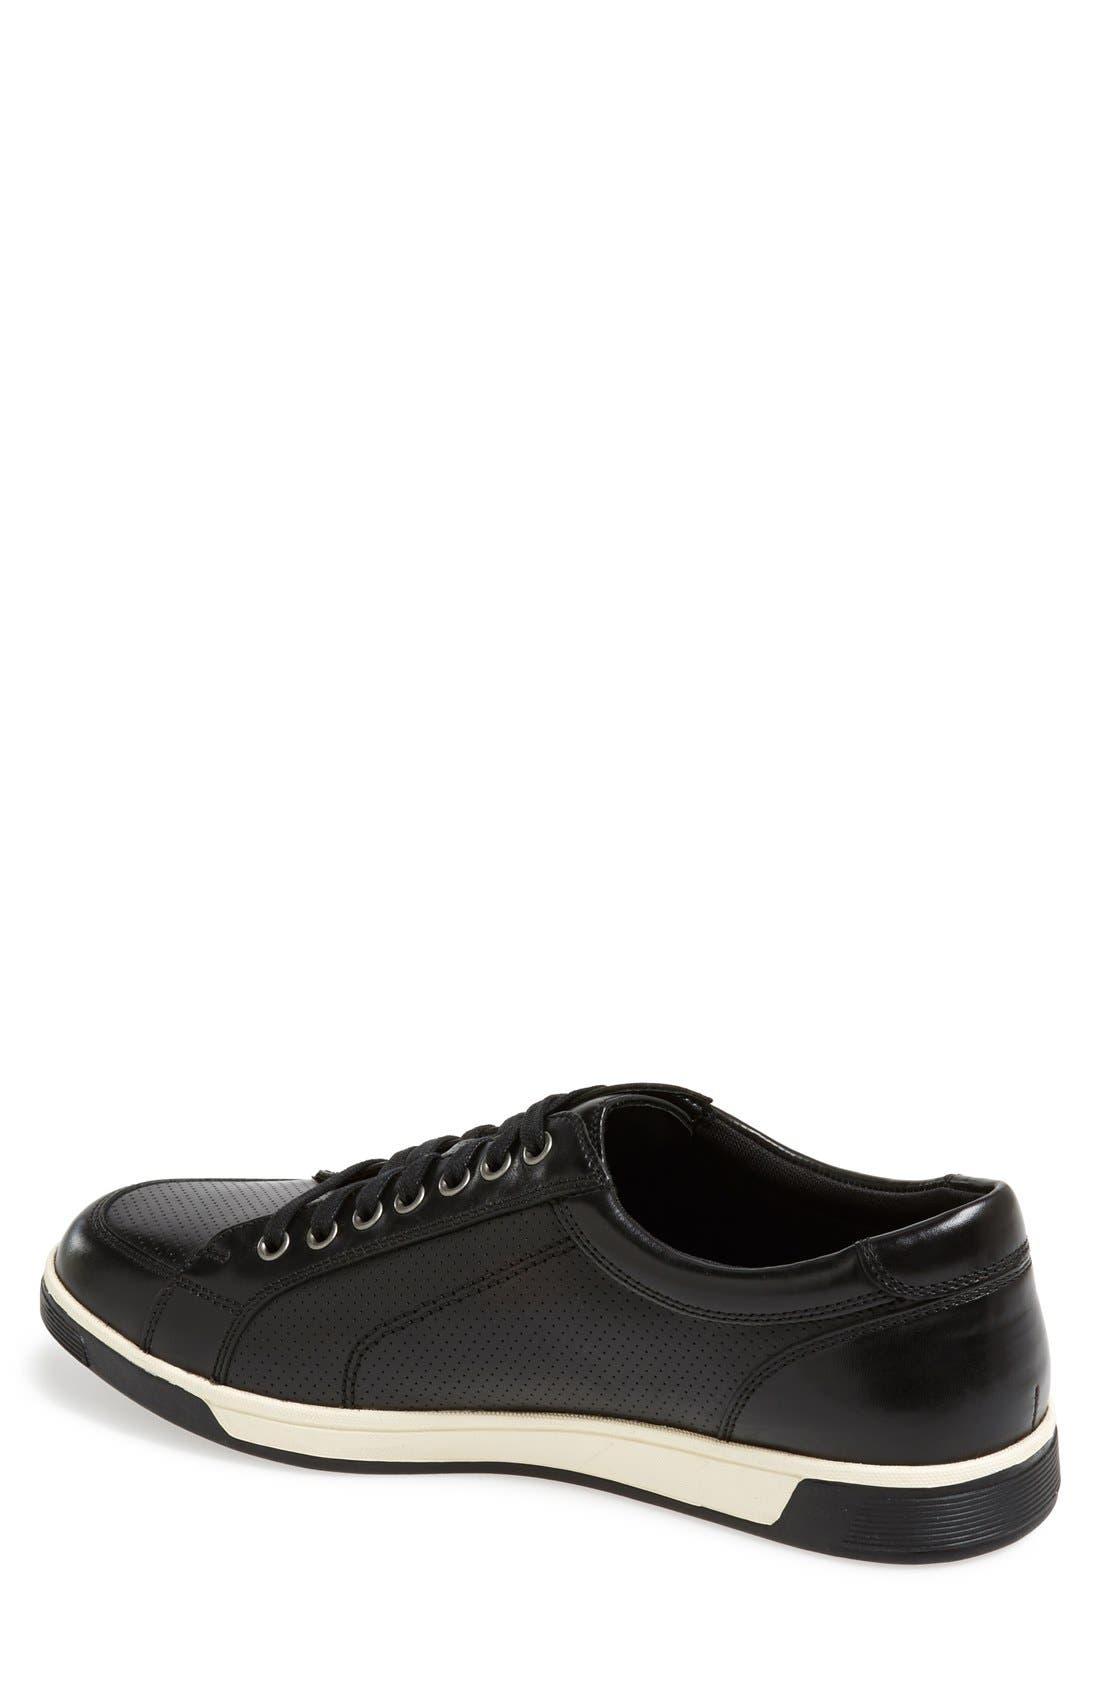 'Vartan Sport Oxford' Sneaker,                             Alternate thumbnail 33, color,